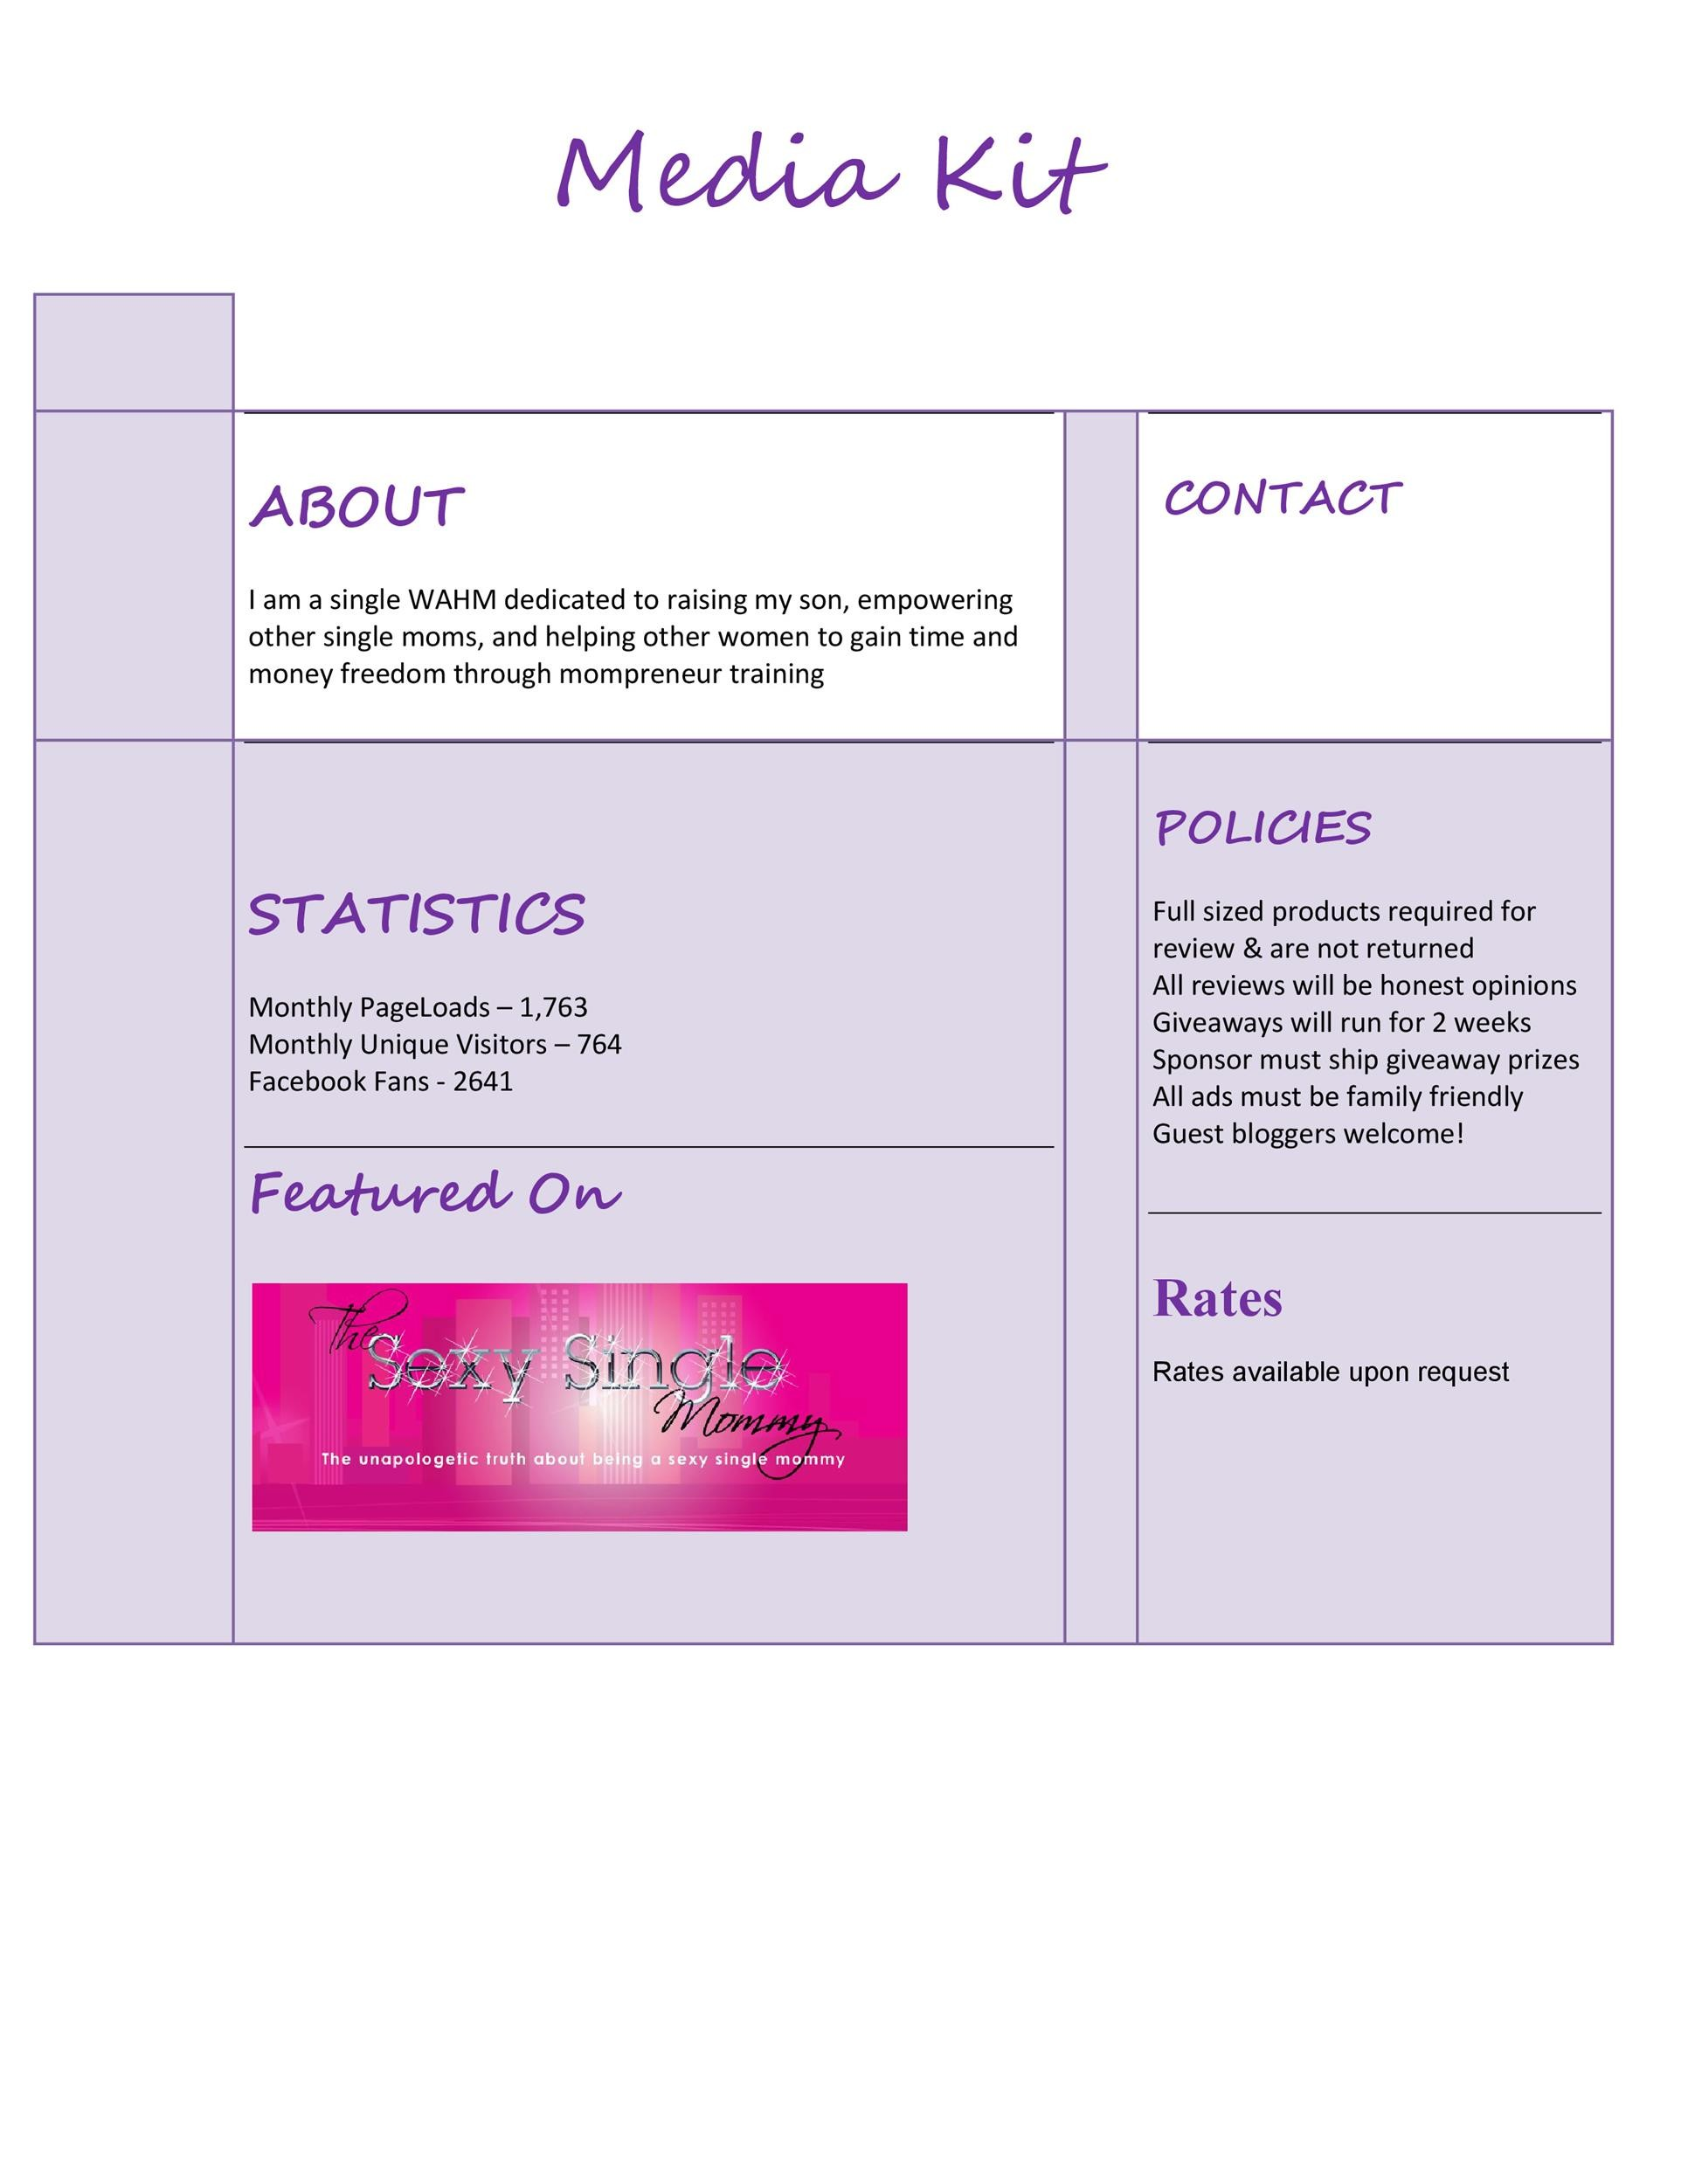 Free media kit template 07